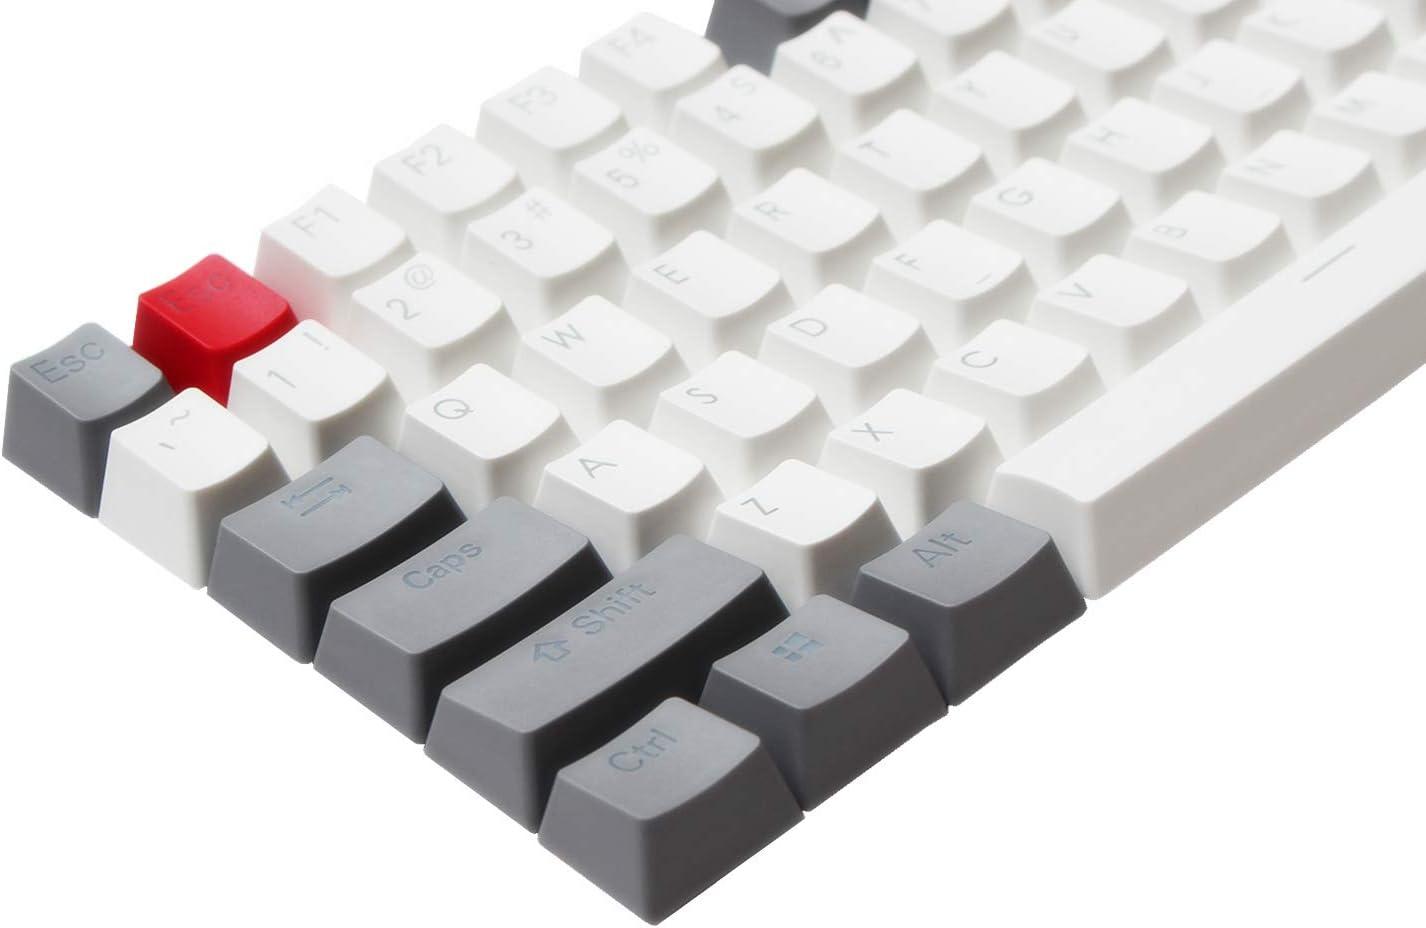 PBT Pudding Keycaps Set with Keycaps Holder Backlit Doubleshot Cherry MX Key Caps ANSI ISO Layout OEM Profile Top Print for 60/% Black Combo 87 TKL// 104//108 MX Switches Mechanical Gaming Keyboard